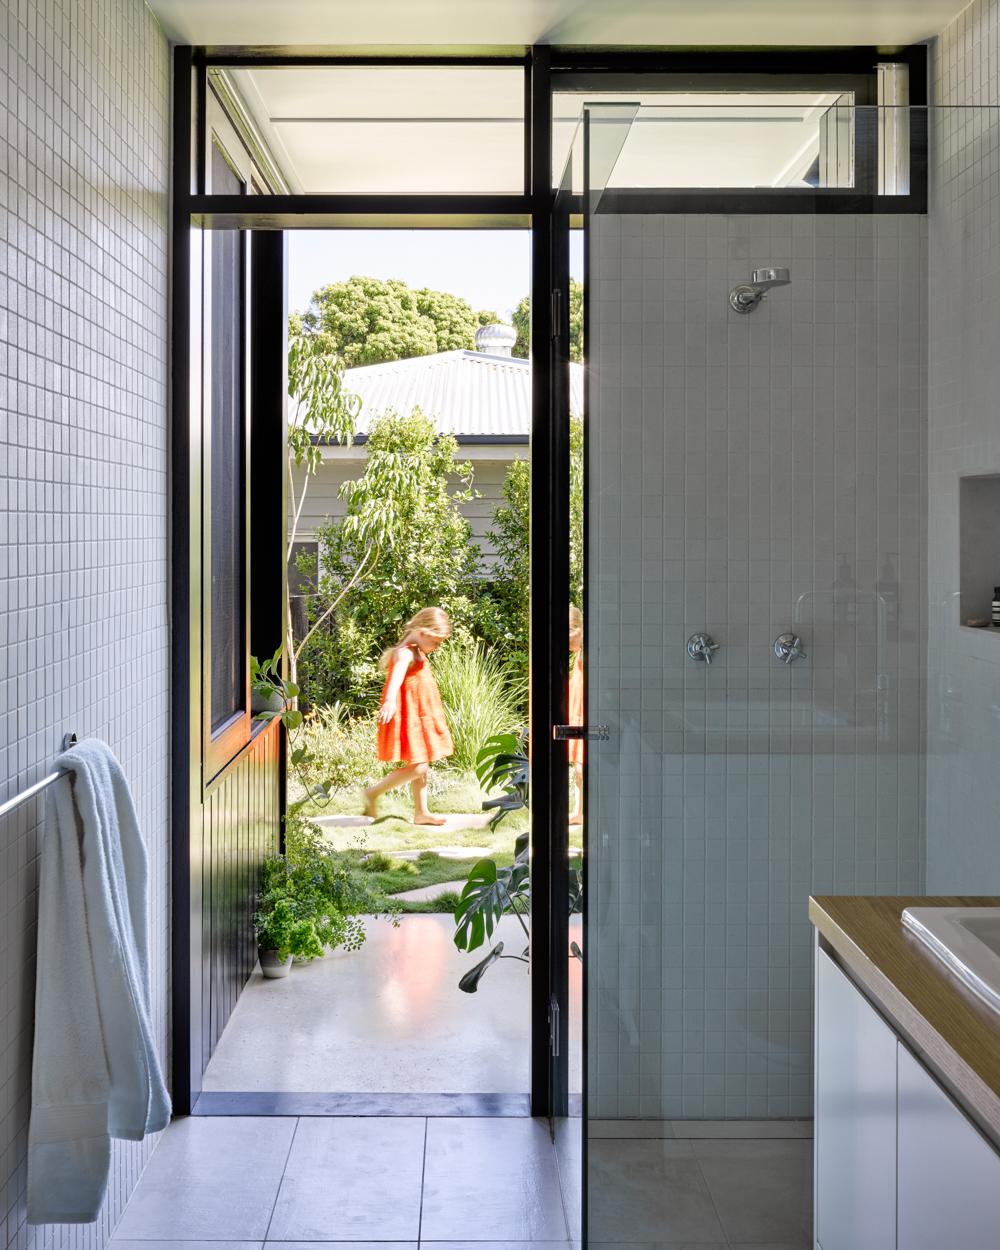 SP Studio - Jacaranda House-the-design-emotive-57169.jpg